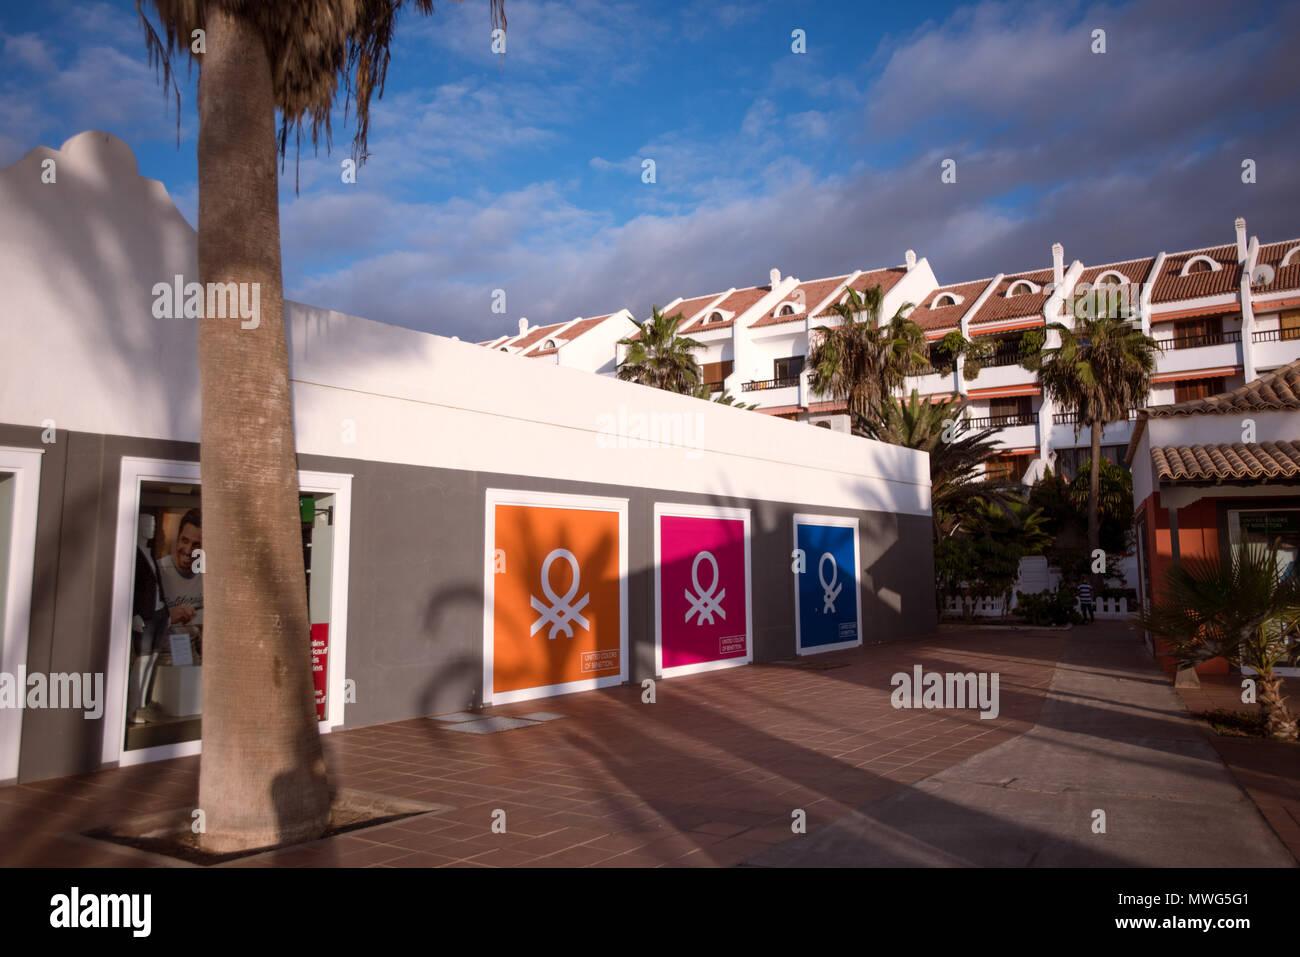 United Colours of Benetton Store, Tenerife. - Stock Image